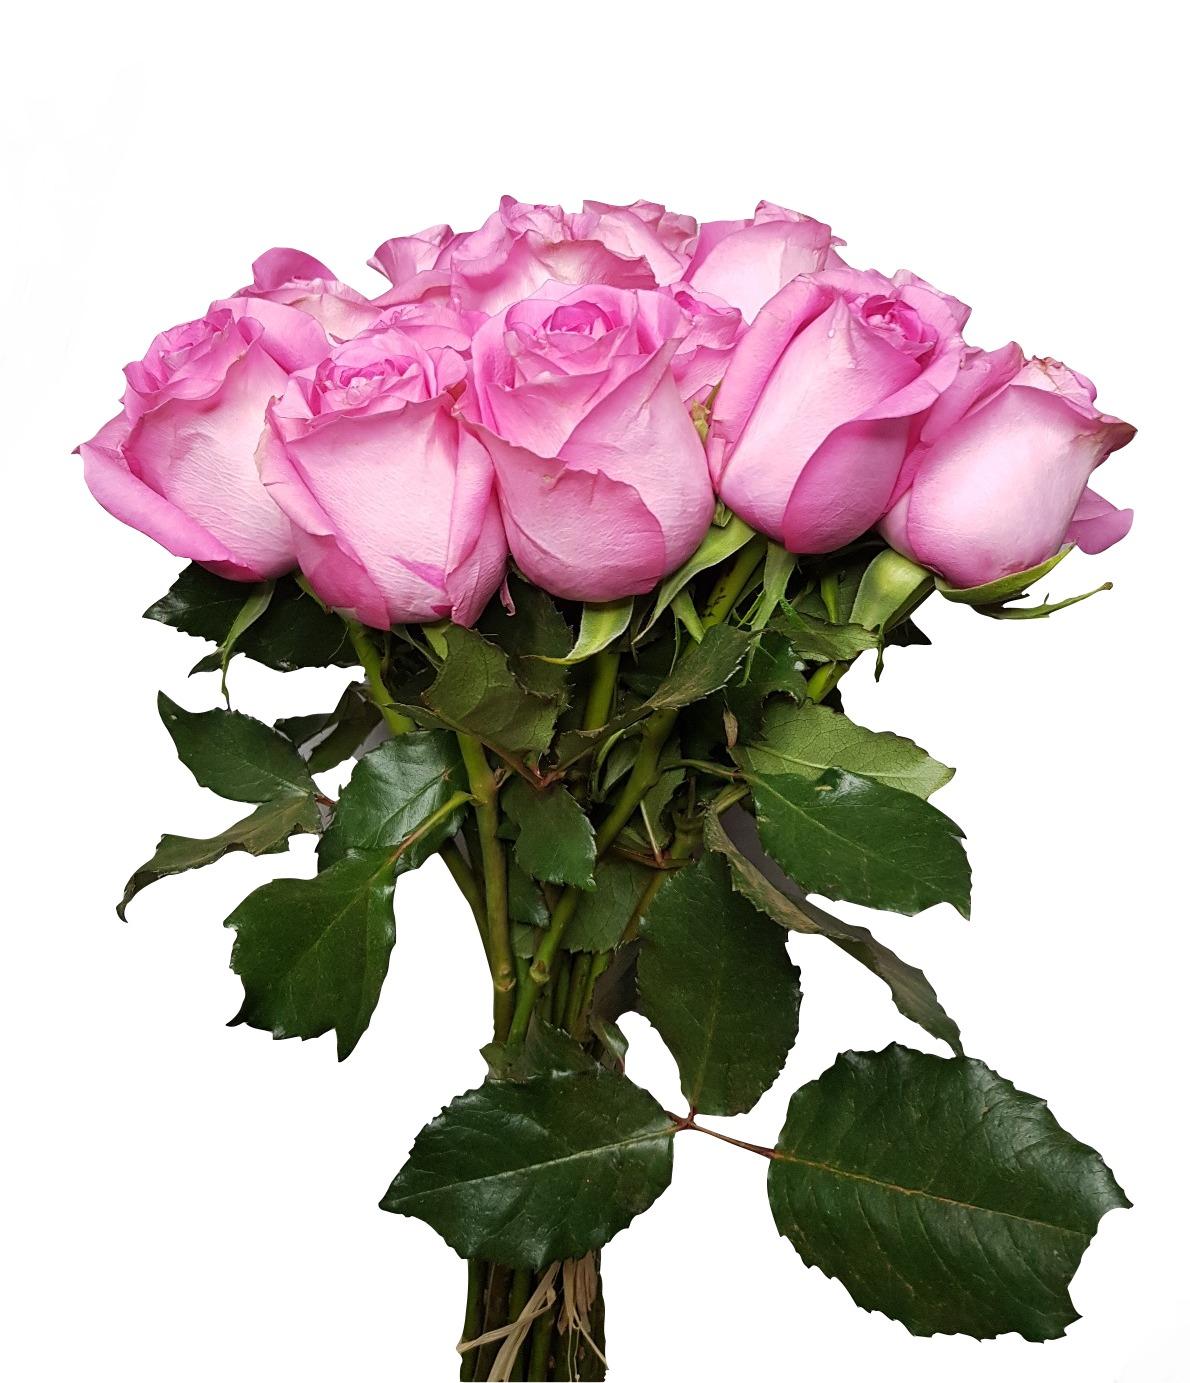 Rose - Pink Wholesale Flowers